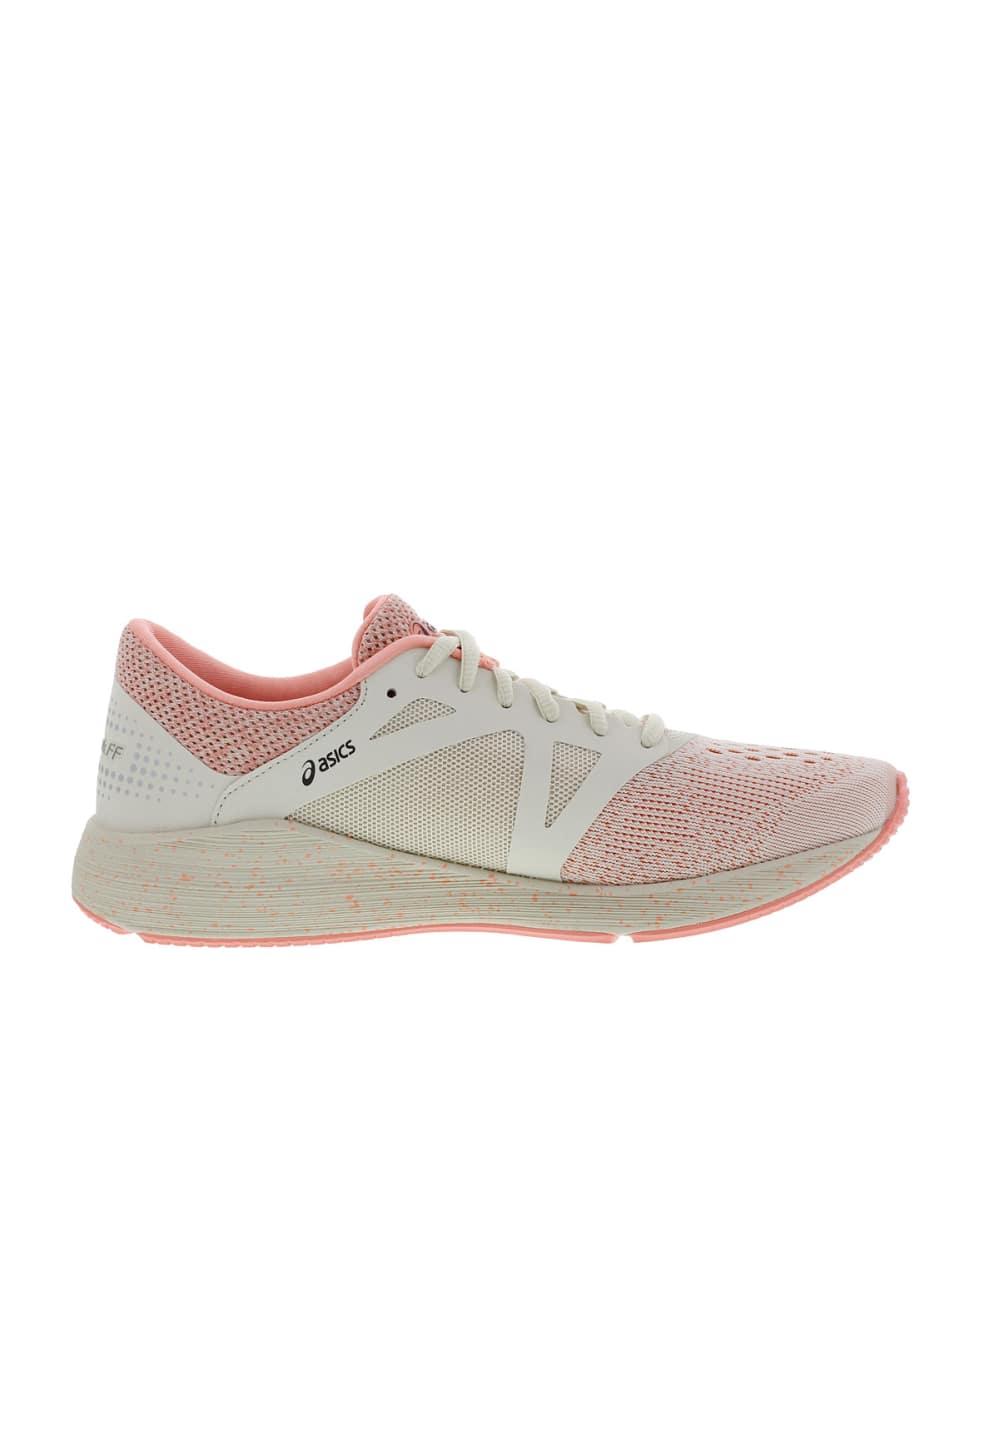 ASICS Roadhawk FF Sp - Laufschuhe für Damen - Pink